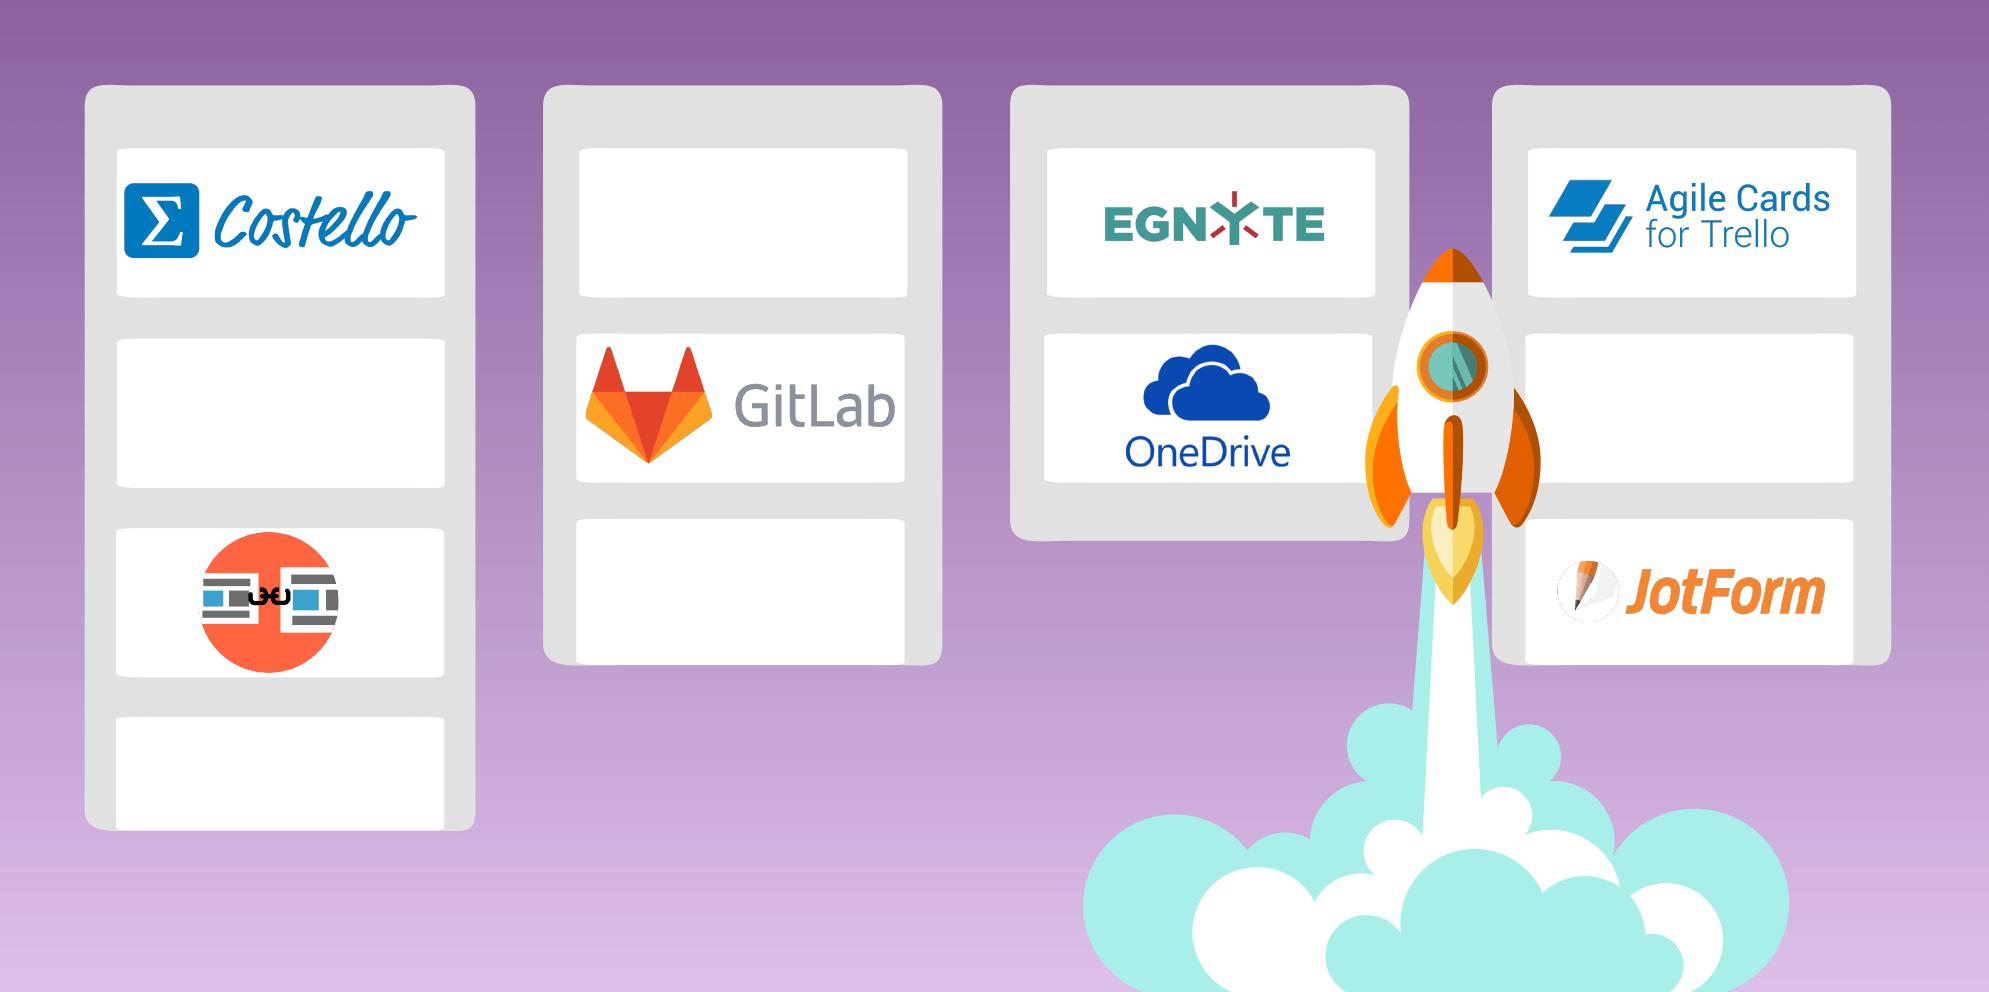 Trello Power-Ups with GitLab, OneDrive, JotForm, Egnyte, Unito, Costello, Agile Cards